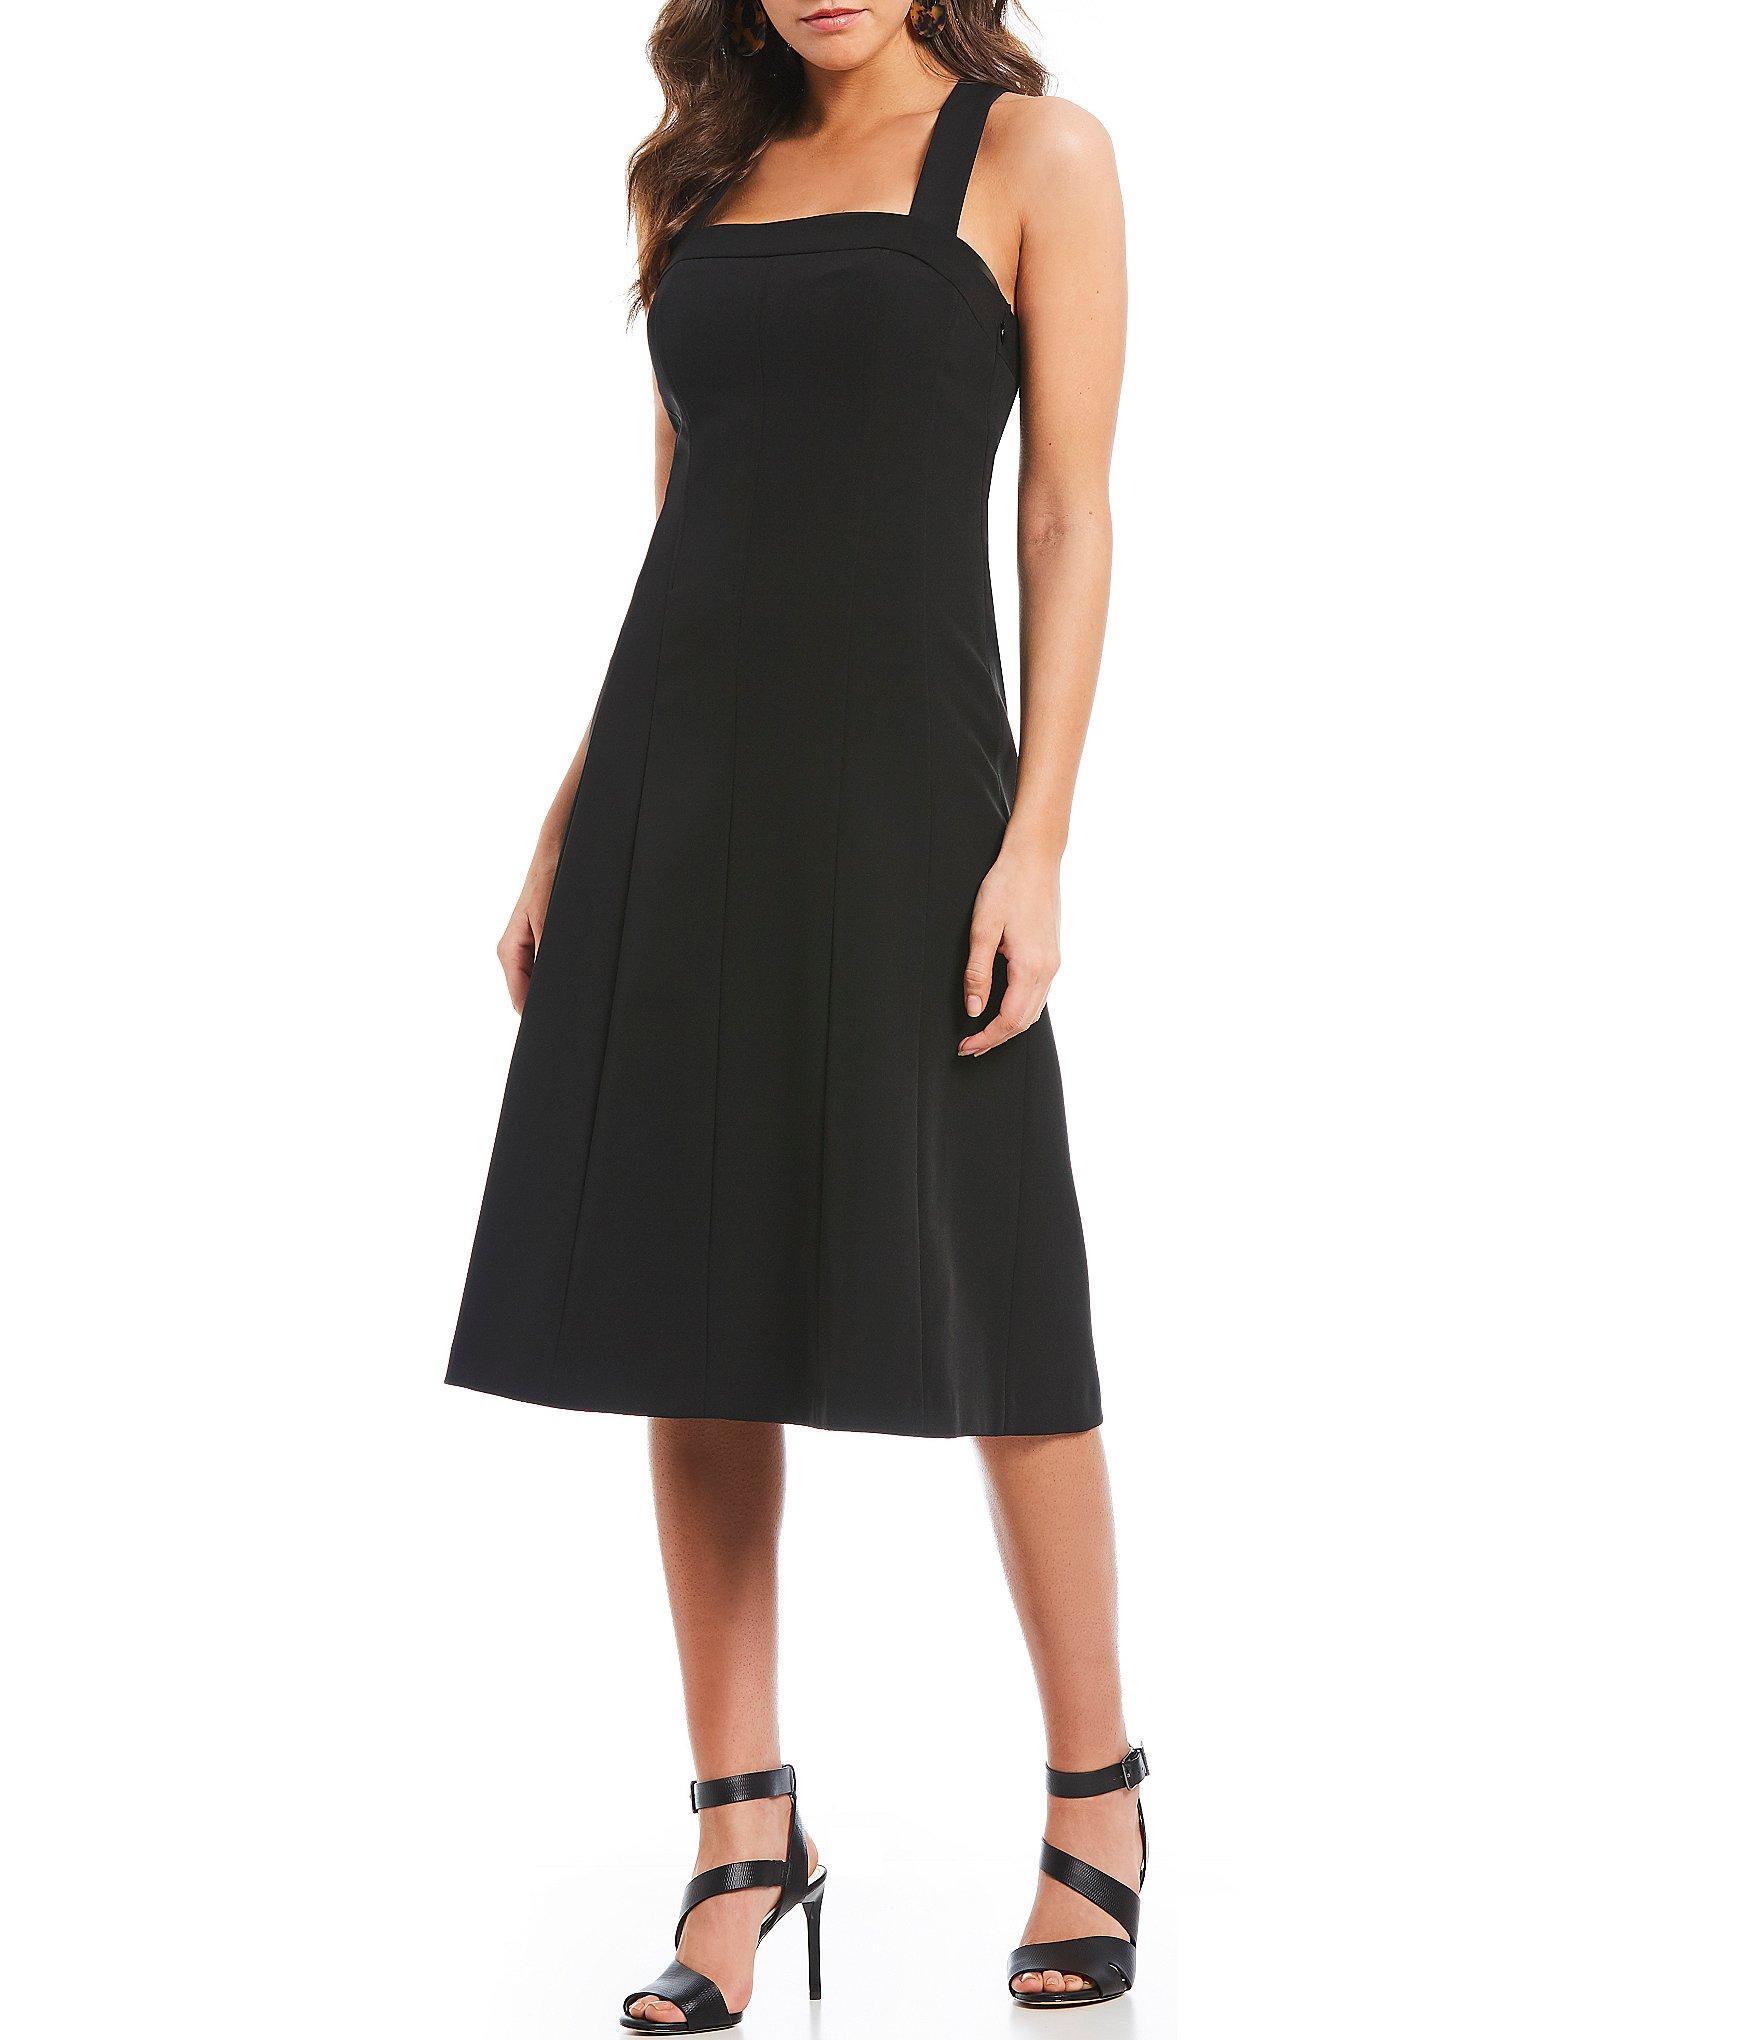 1f42b6158 Gianni Bini Gia Sleeveless Square Neckline Midi Dress in Black - Lyst